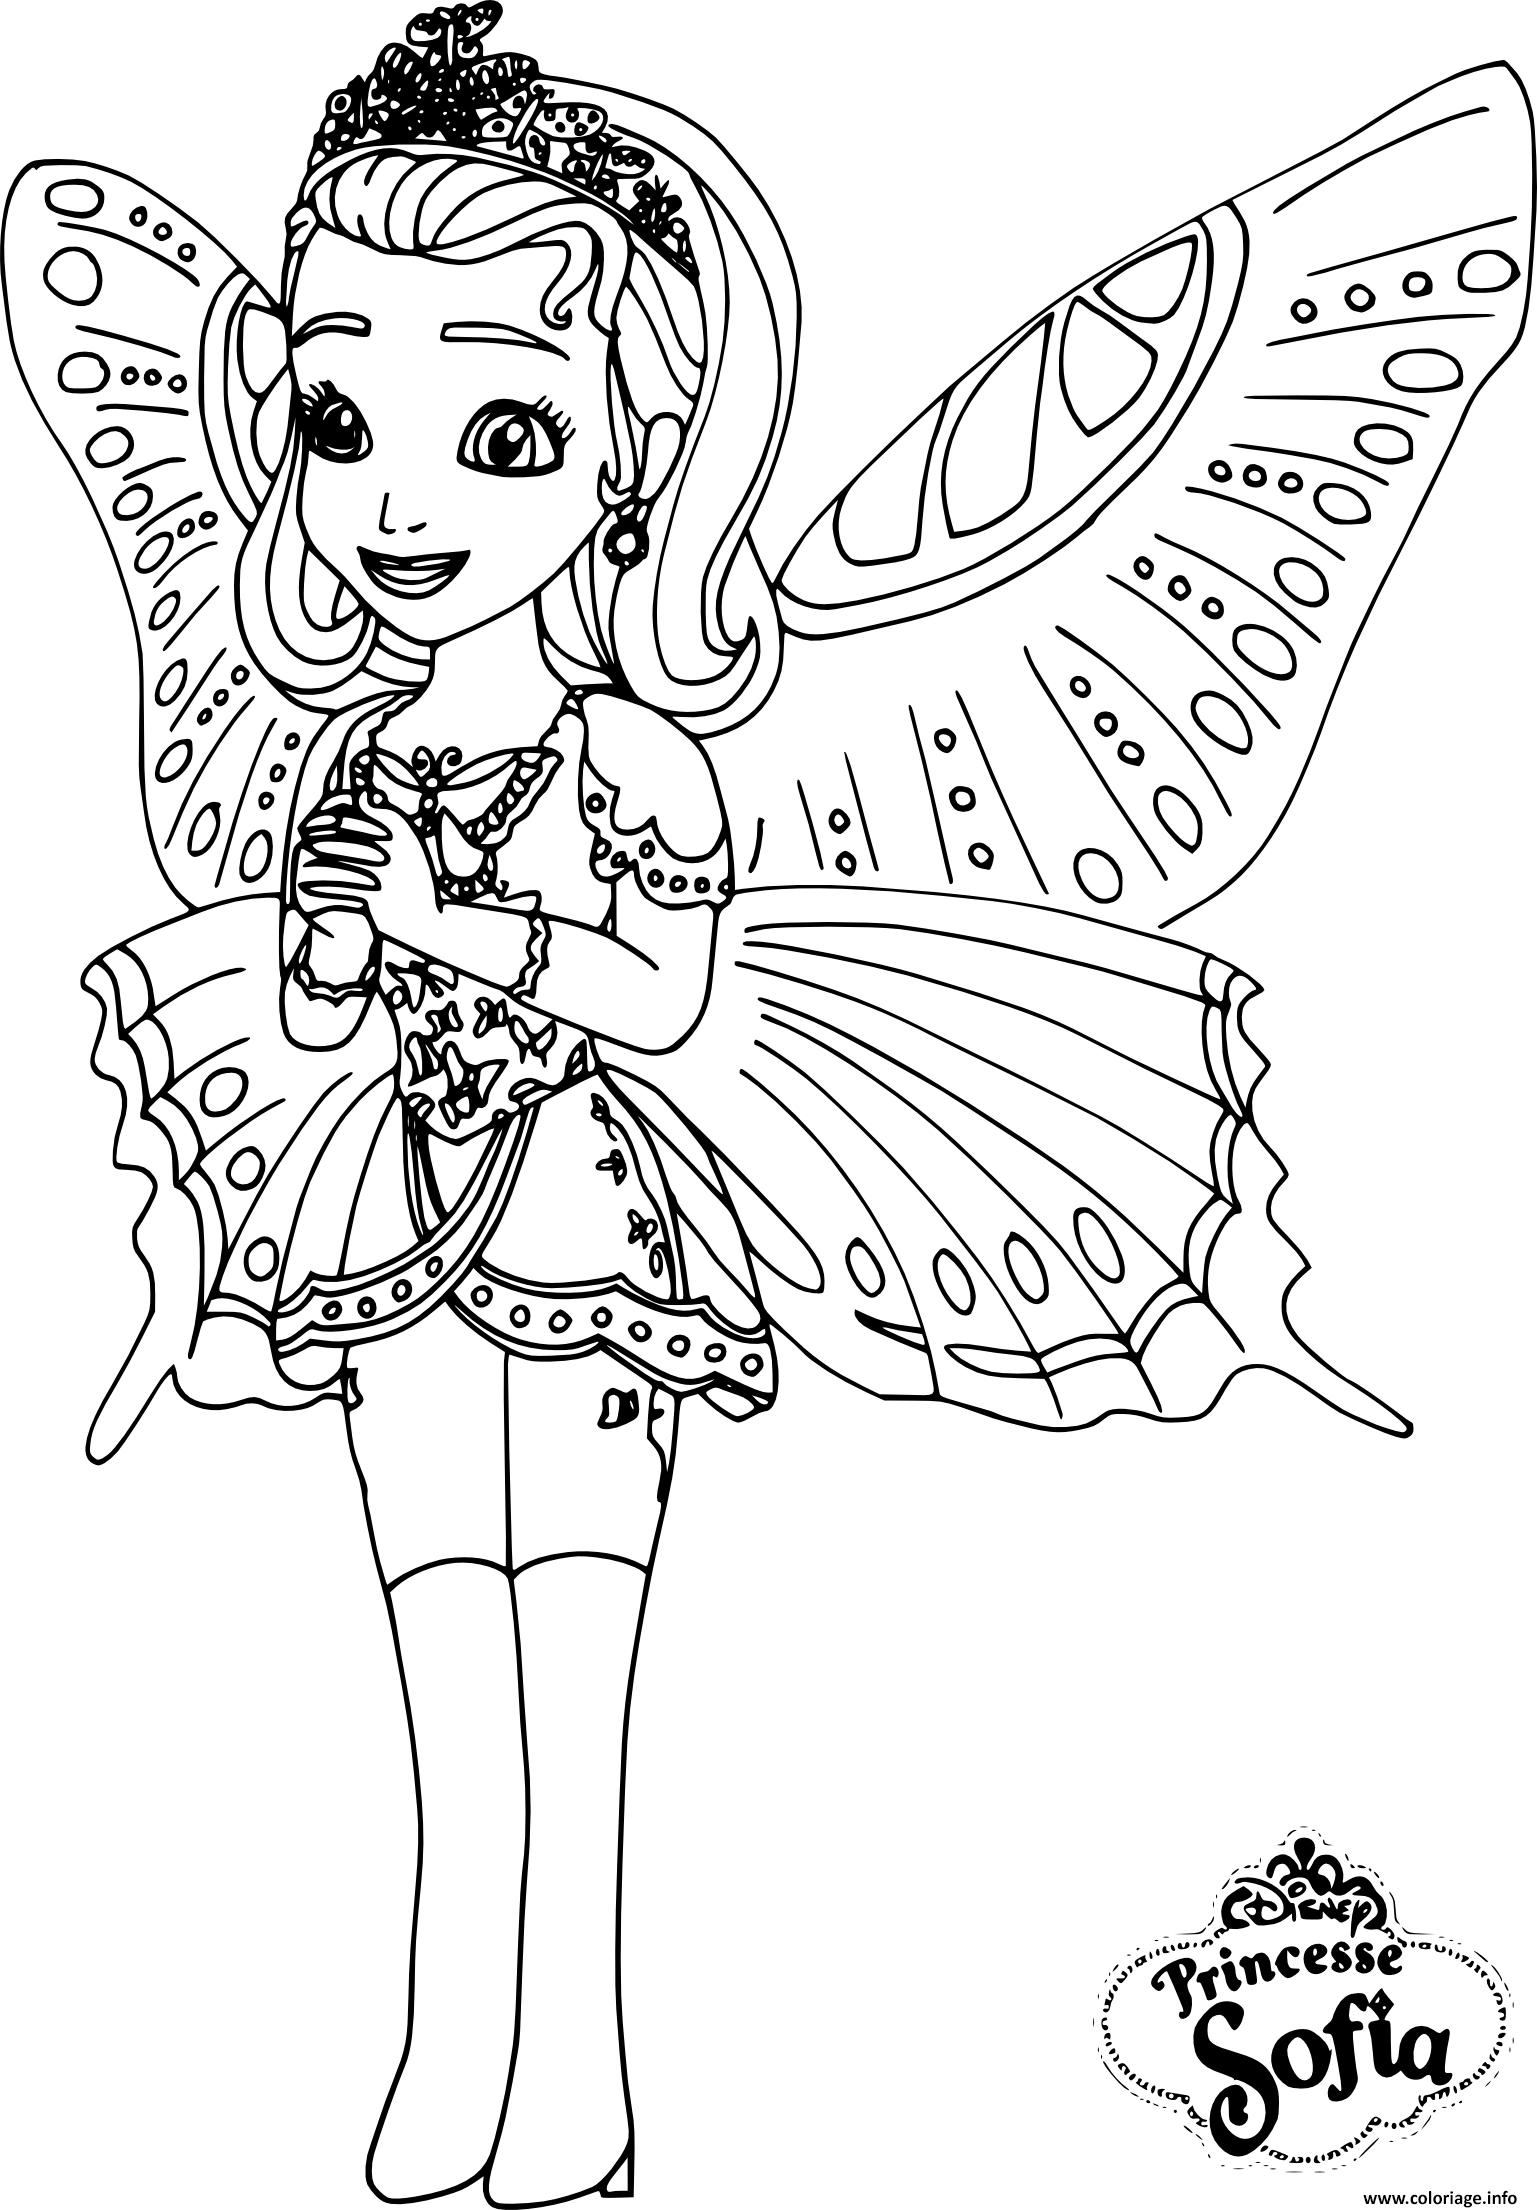 Coloriage Gratuit Imprimer Princesse.Coloriage Princesse Sofia Papillon Jecolorie Com